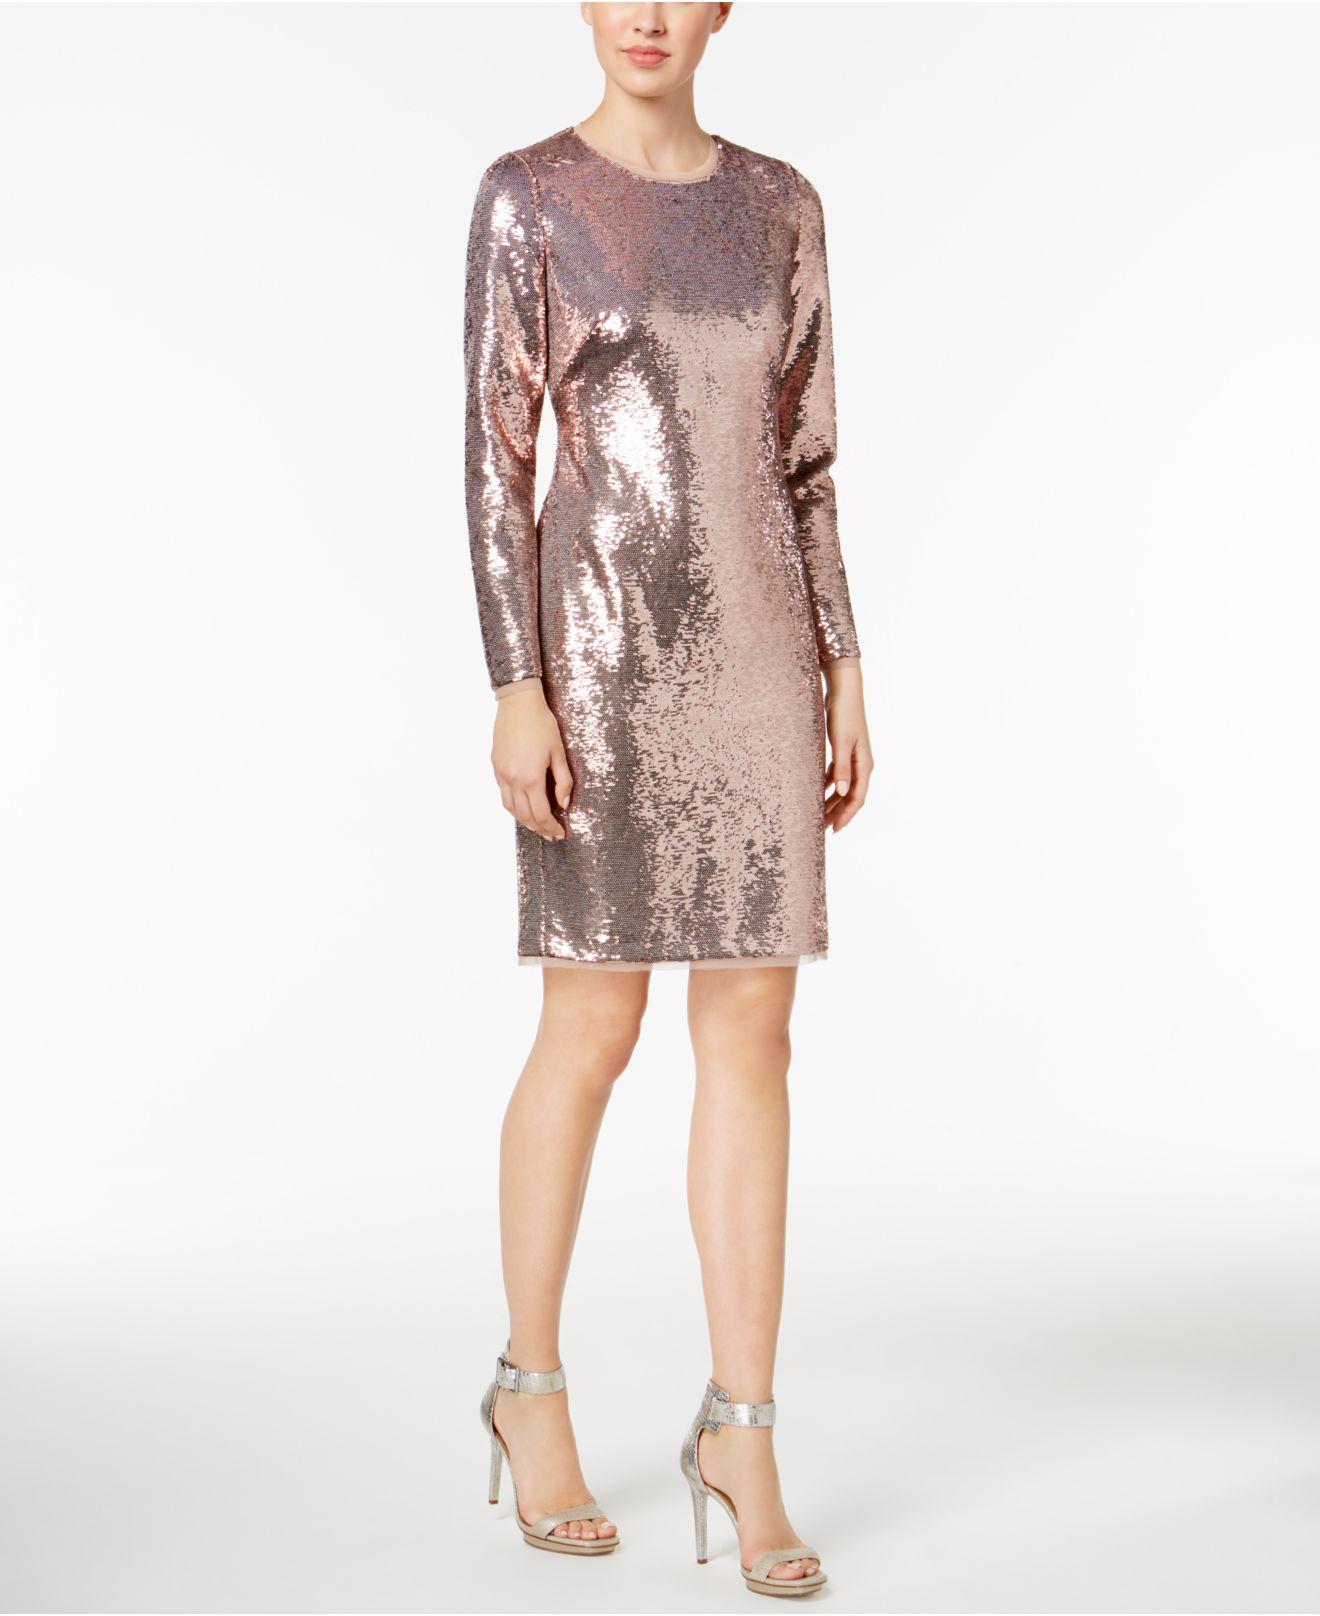 95a44d212 Rose Gold Lace Dress Macys - raveitsafe